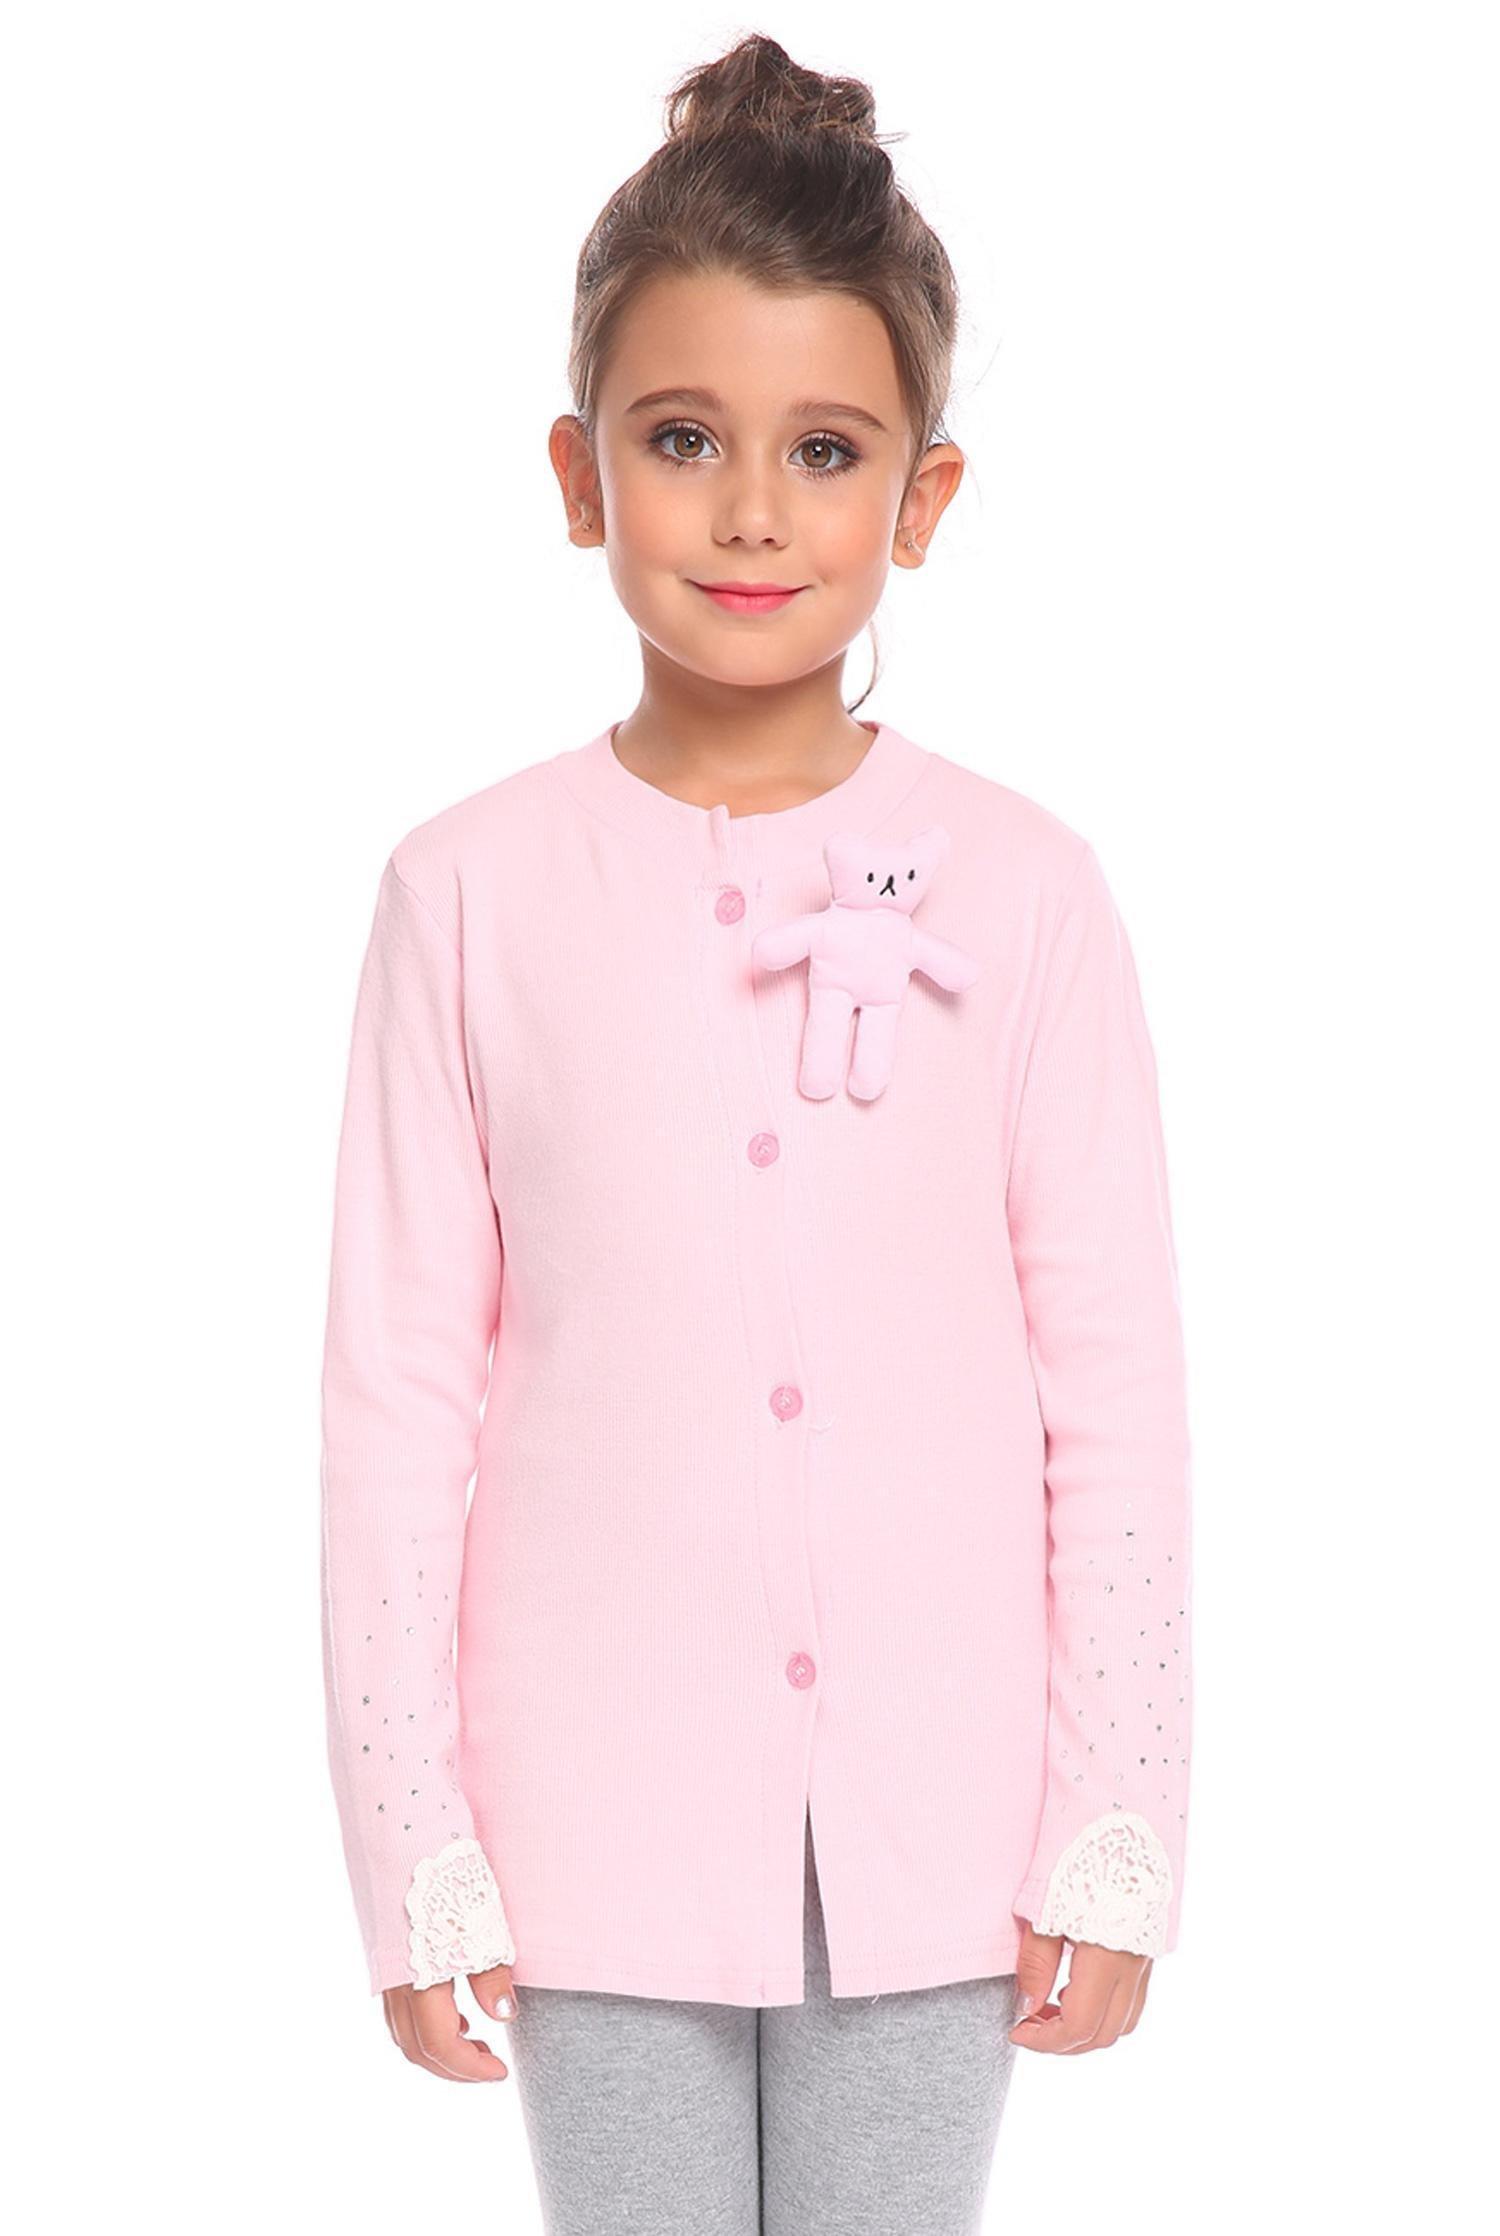 Arshiner Little Girls Crewneck Cardigan Long Sleeve Children Button Cotton Sweater Uniform Tops for Girls